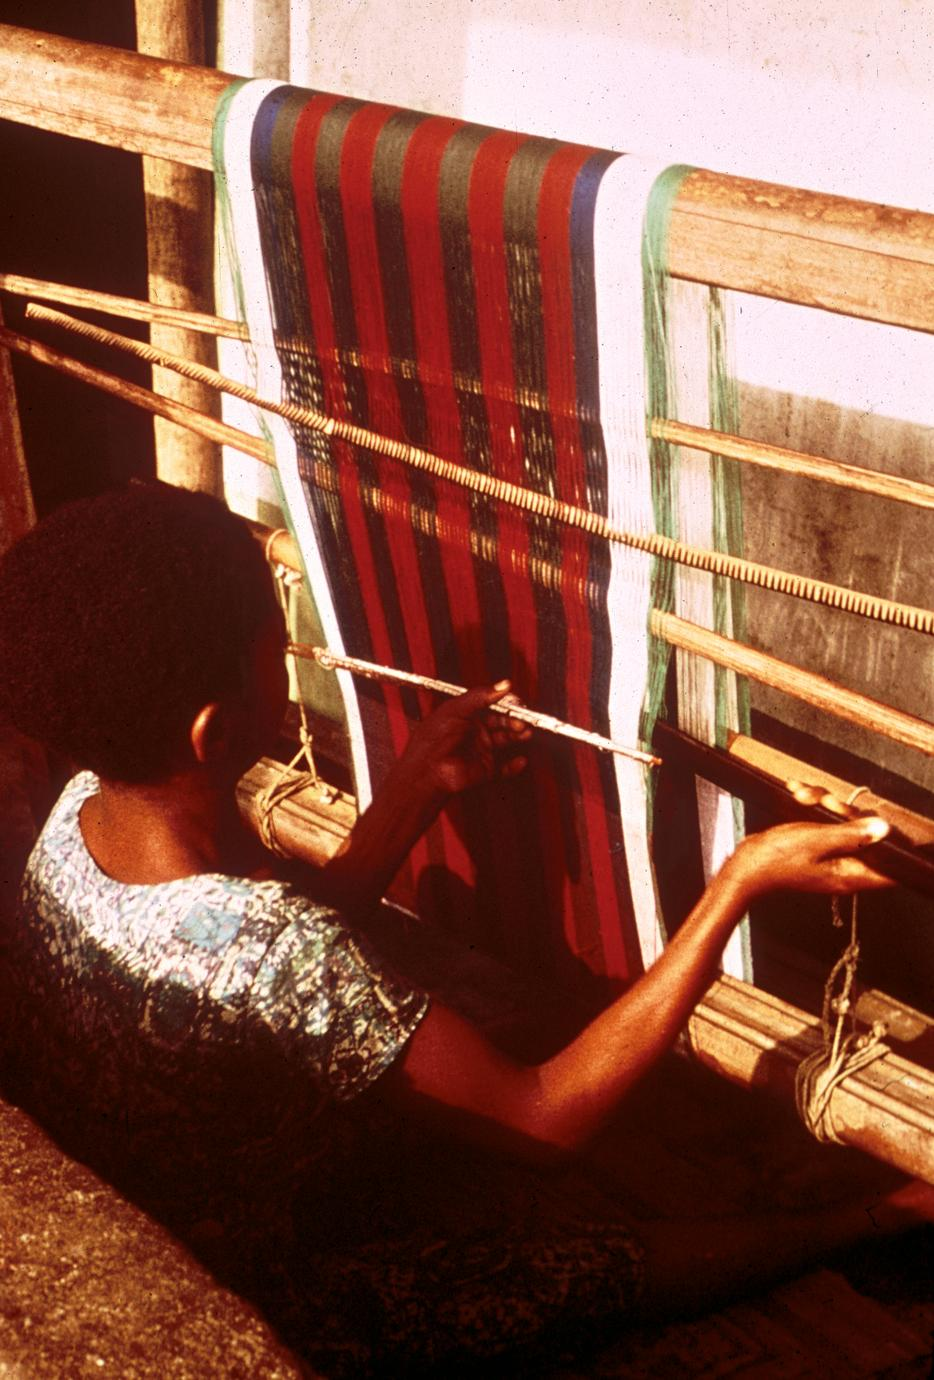 Young Igbo Weaver Working on a Horizontal Loom